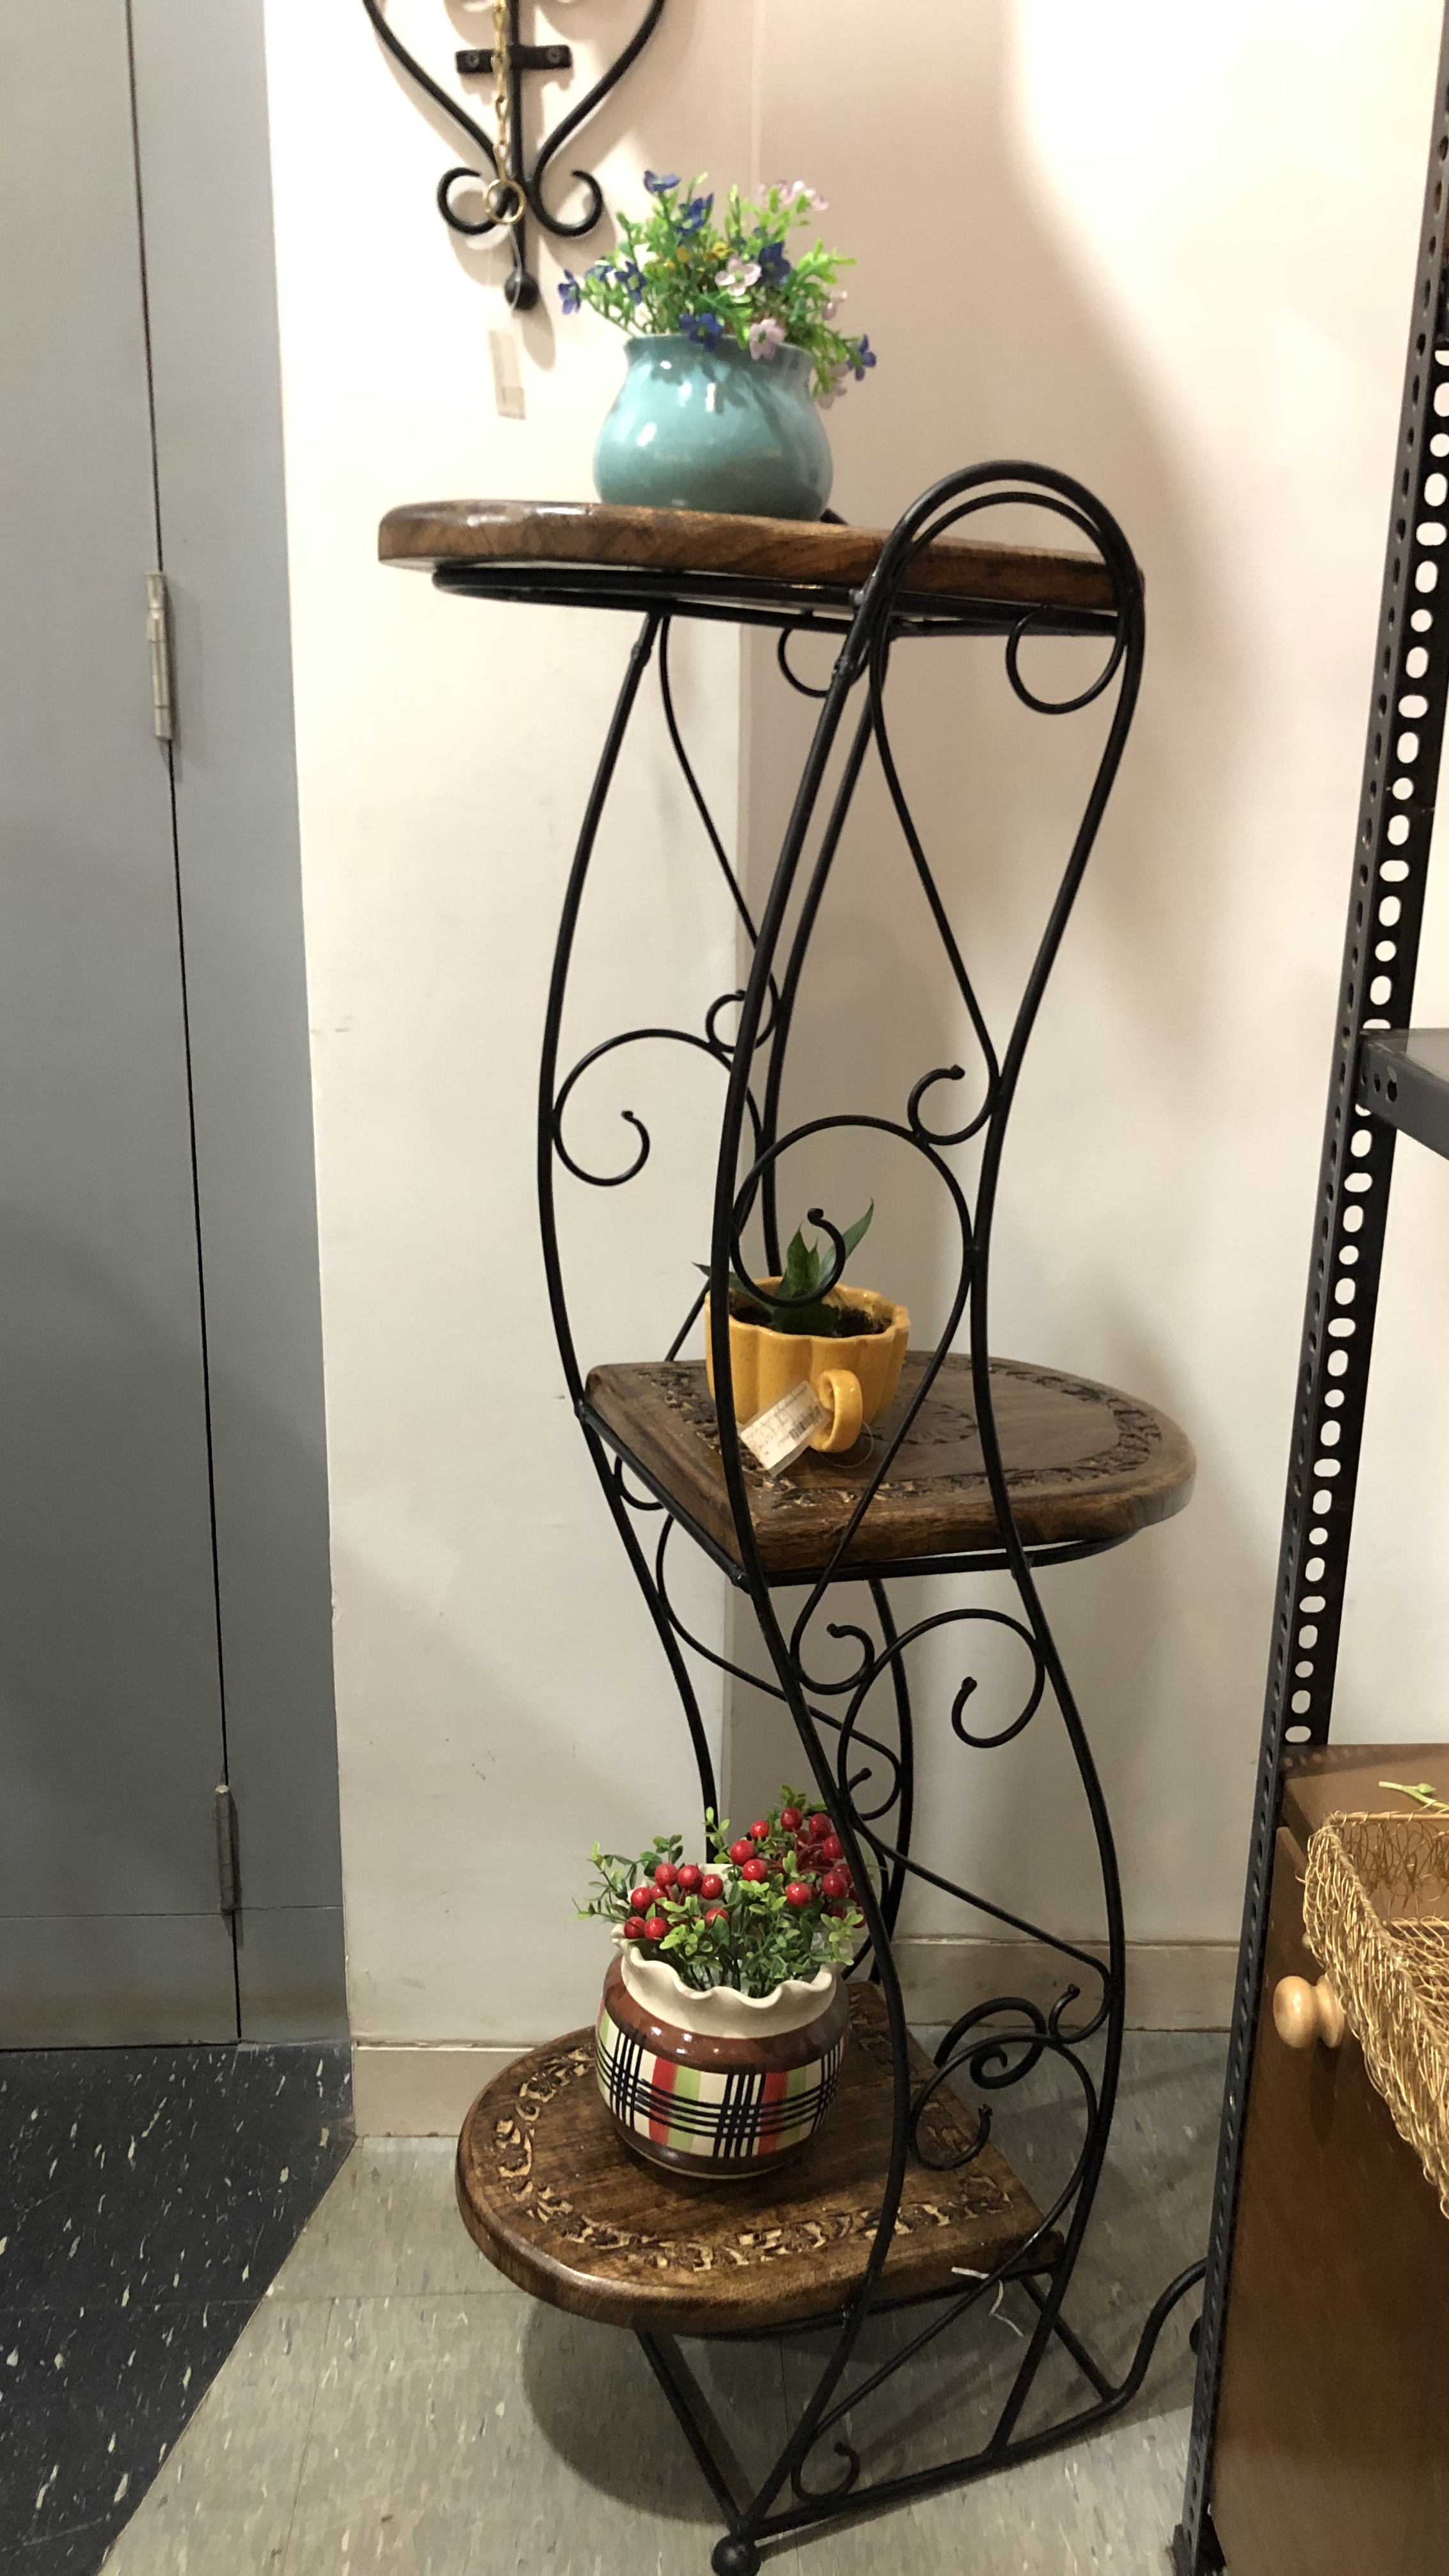 Wooden-iron plant holder